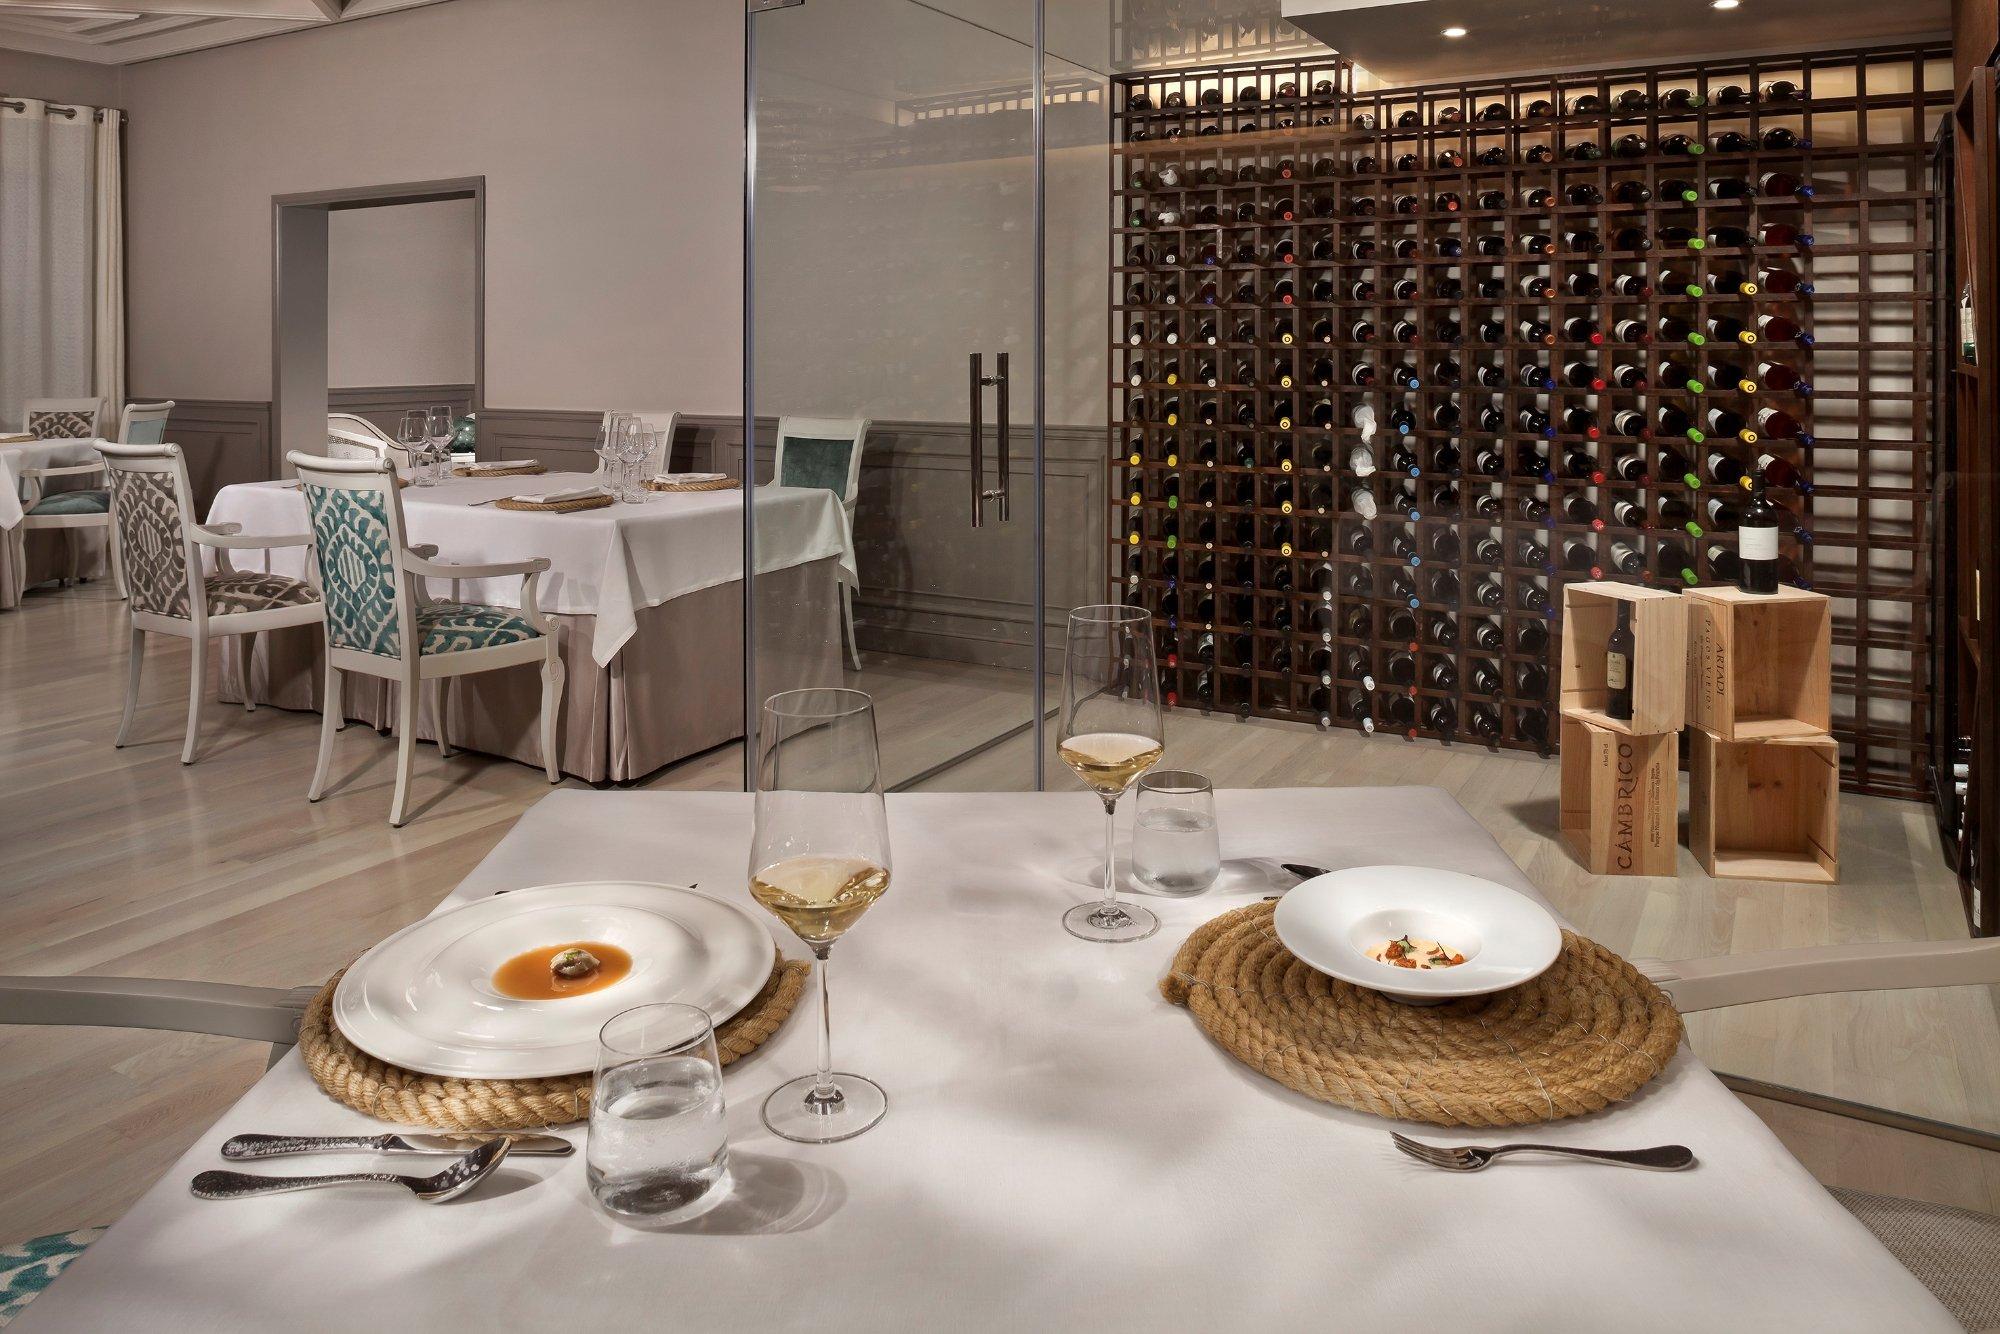 Restaurante Alevante, Novo Sancti Petri